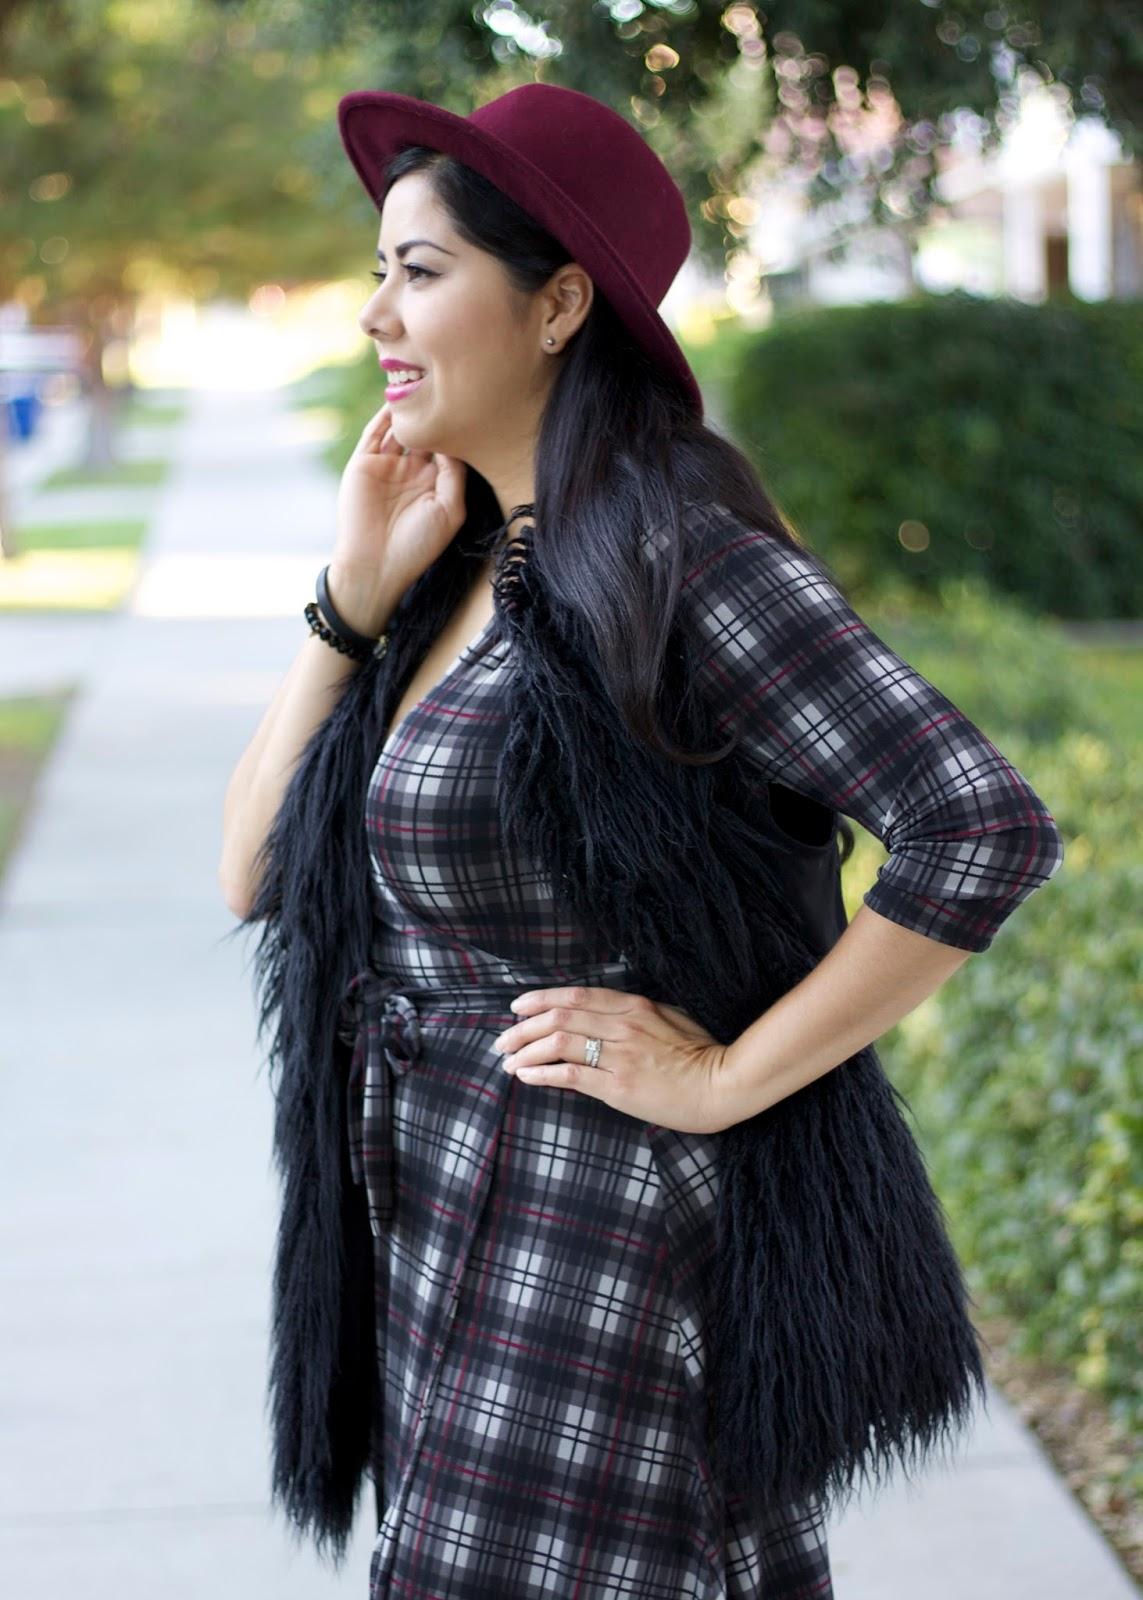 Fall Hats, Fall 2015 Hats, Merona maroon hat, cabi clothing blogger, cabi vest 2015, black faux fur vest